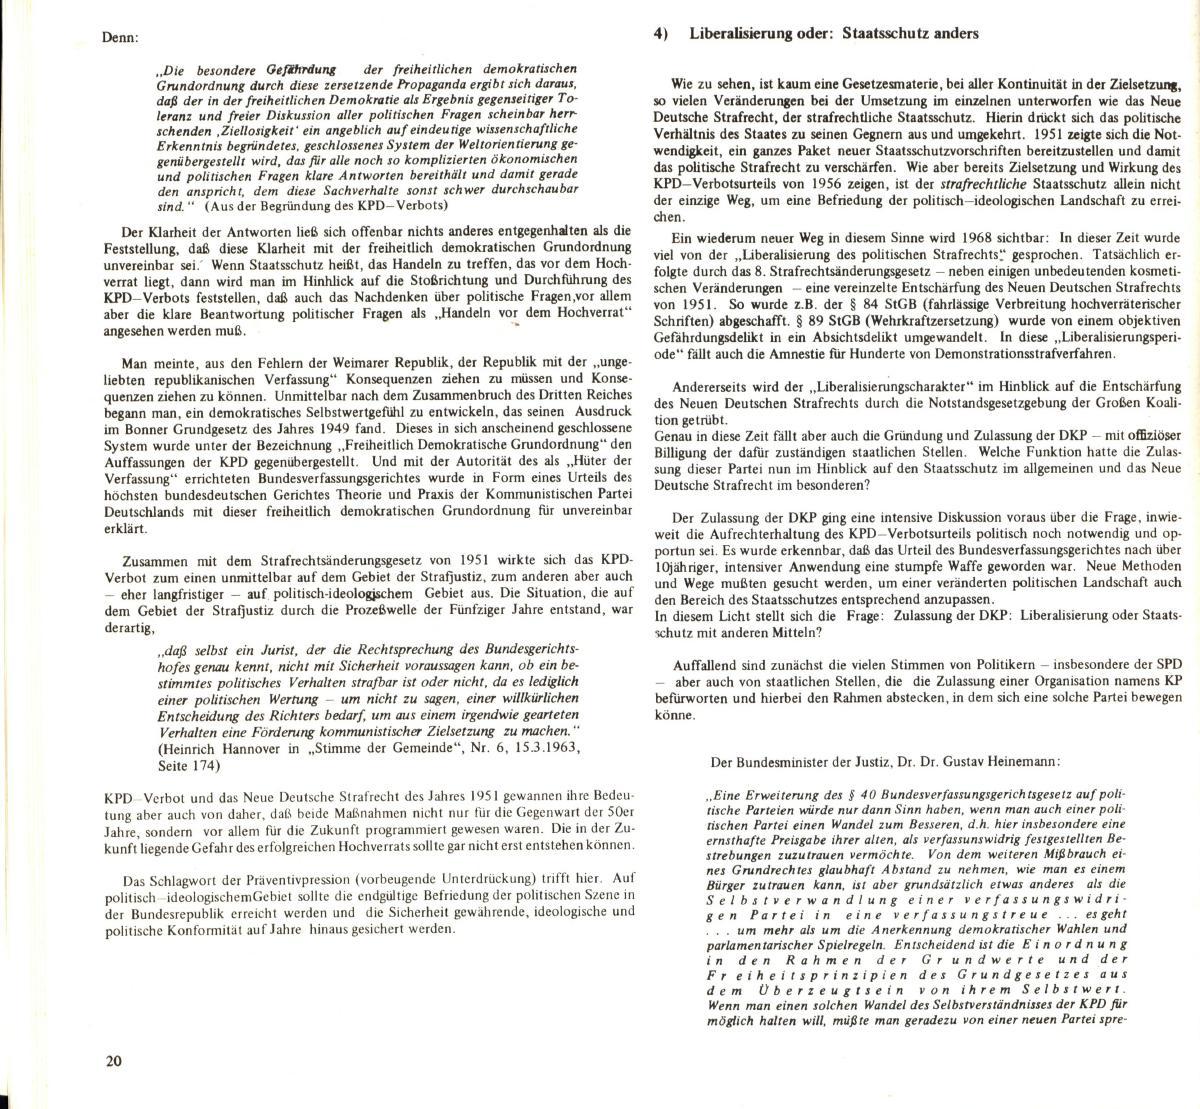 REP_VLB_1976_Die_Zensurgesetze_21